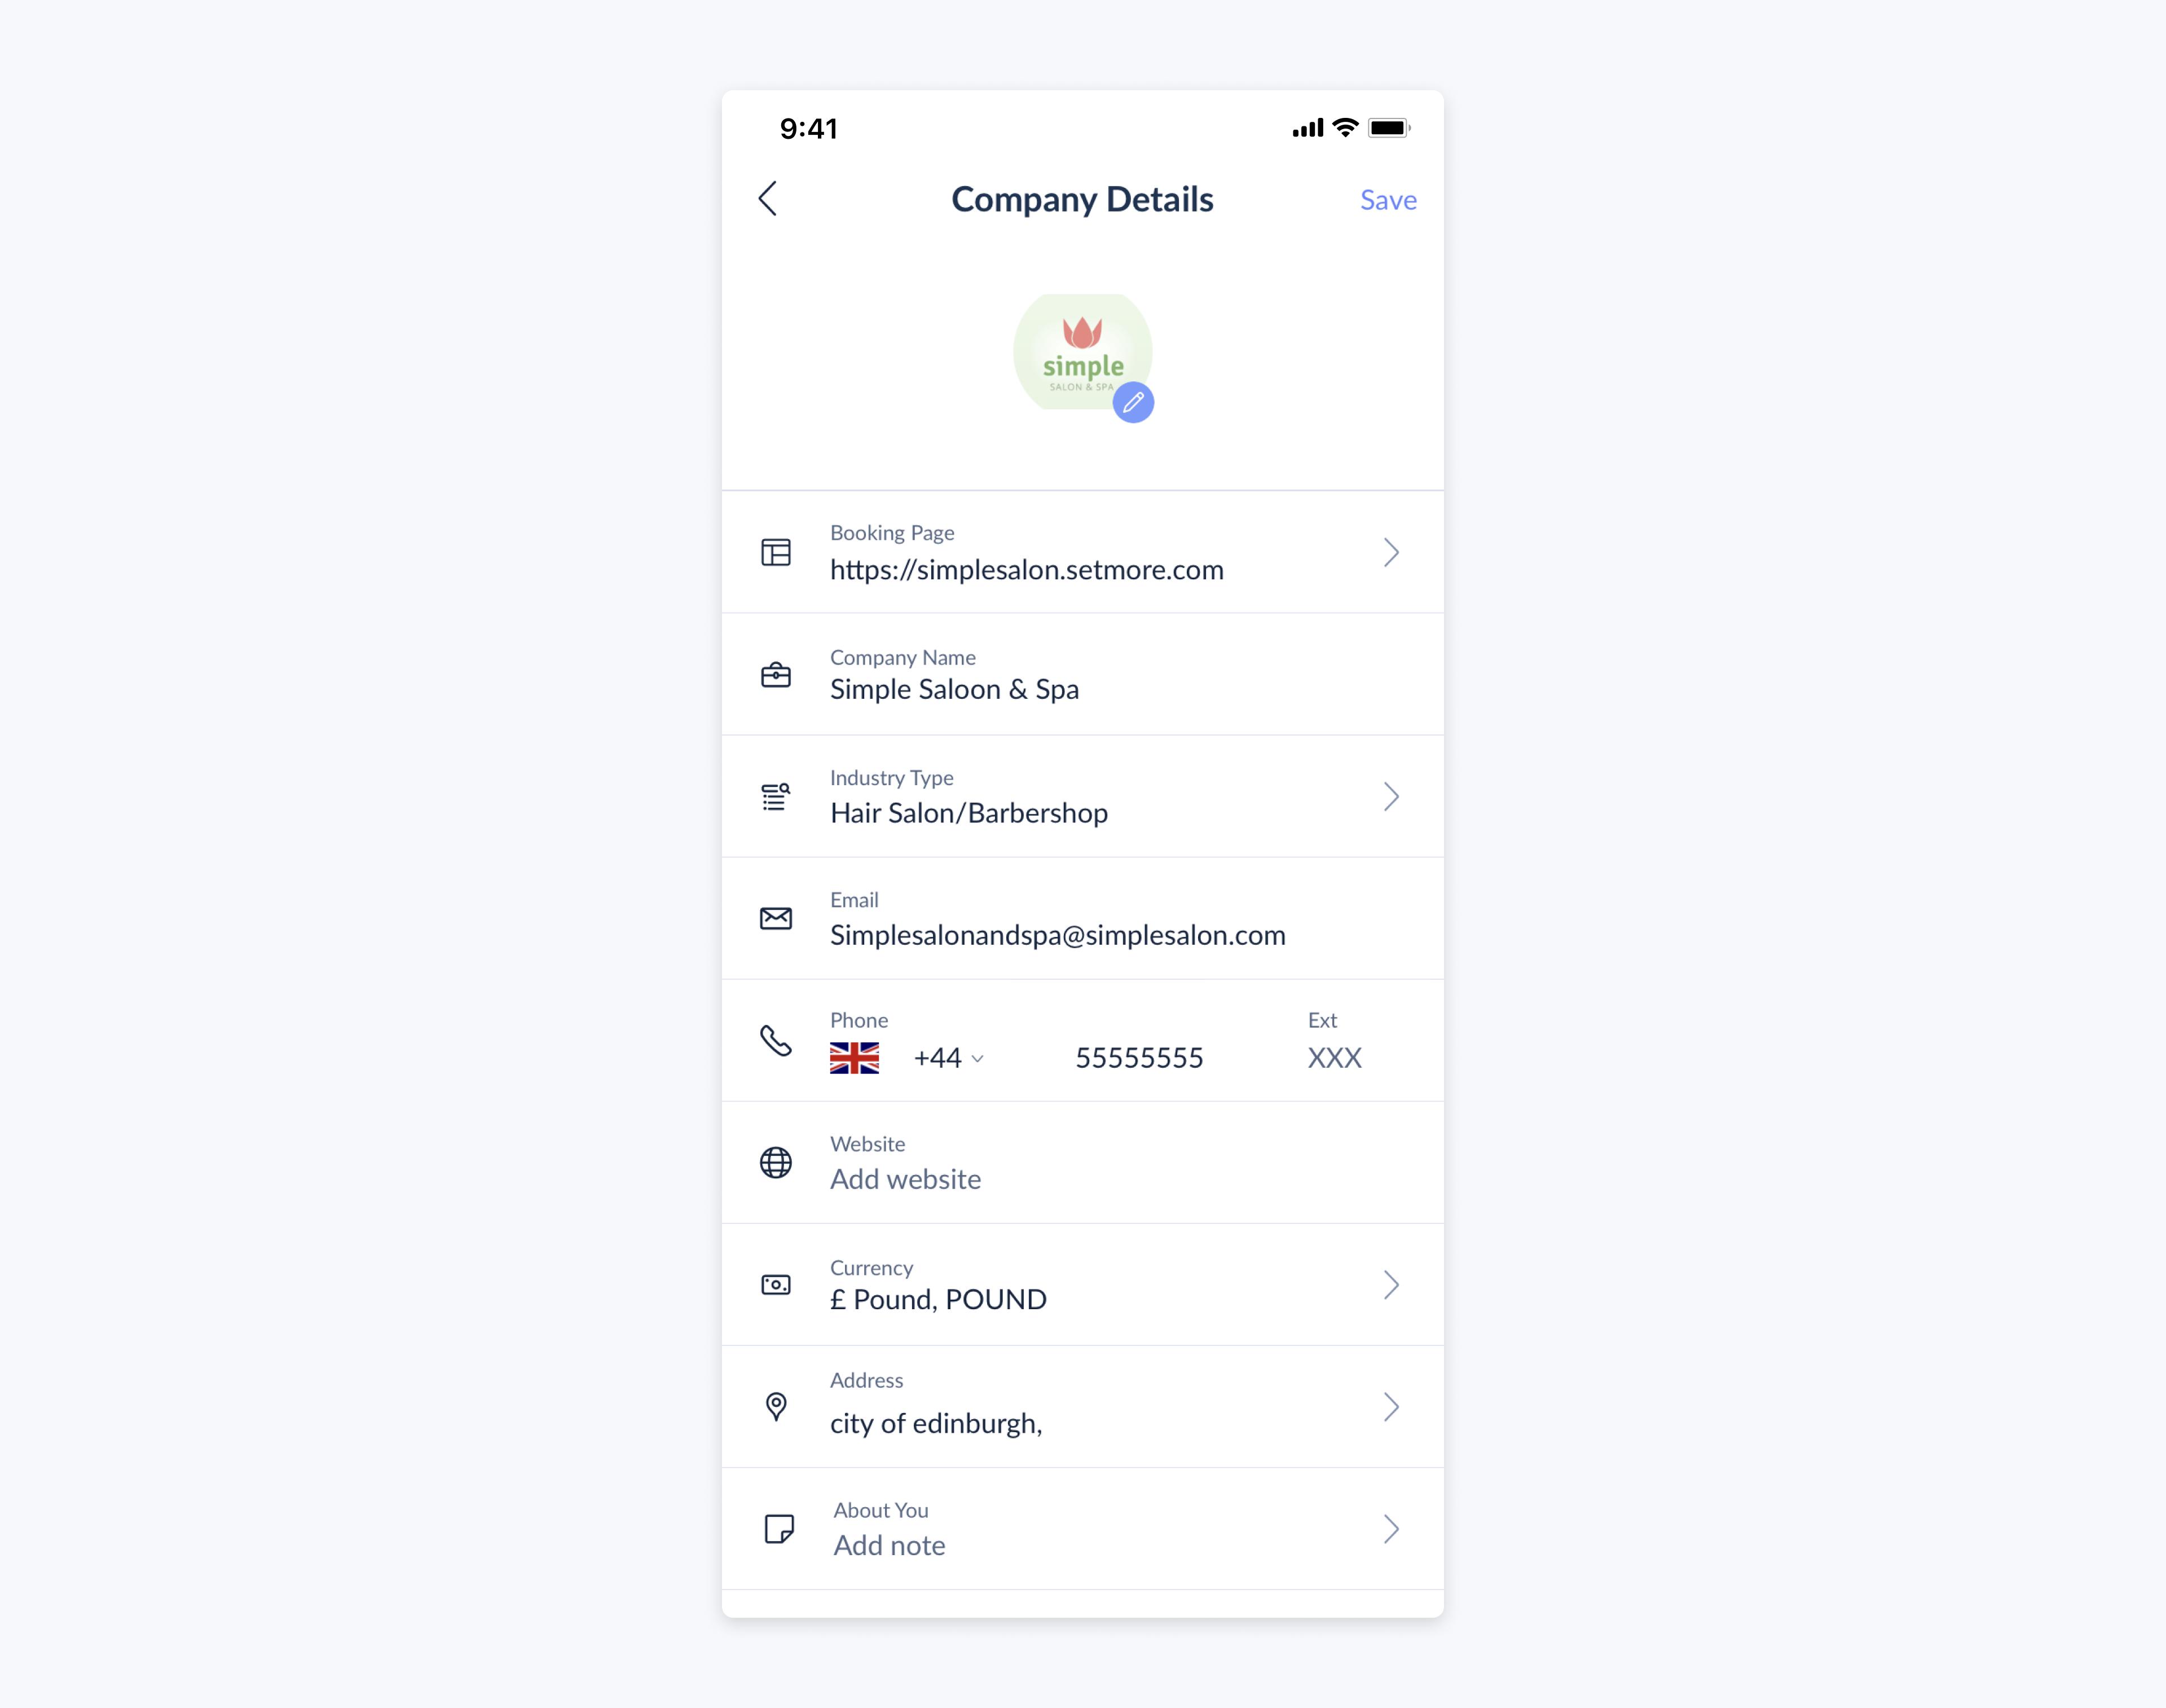 setmore app company details full information